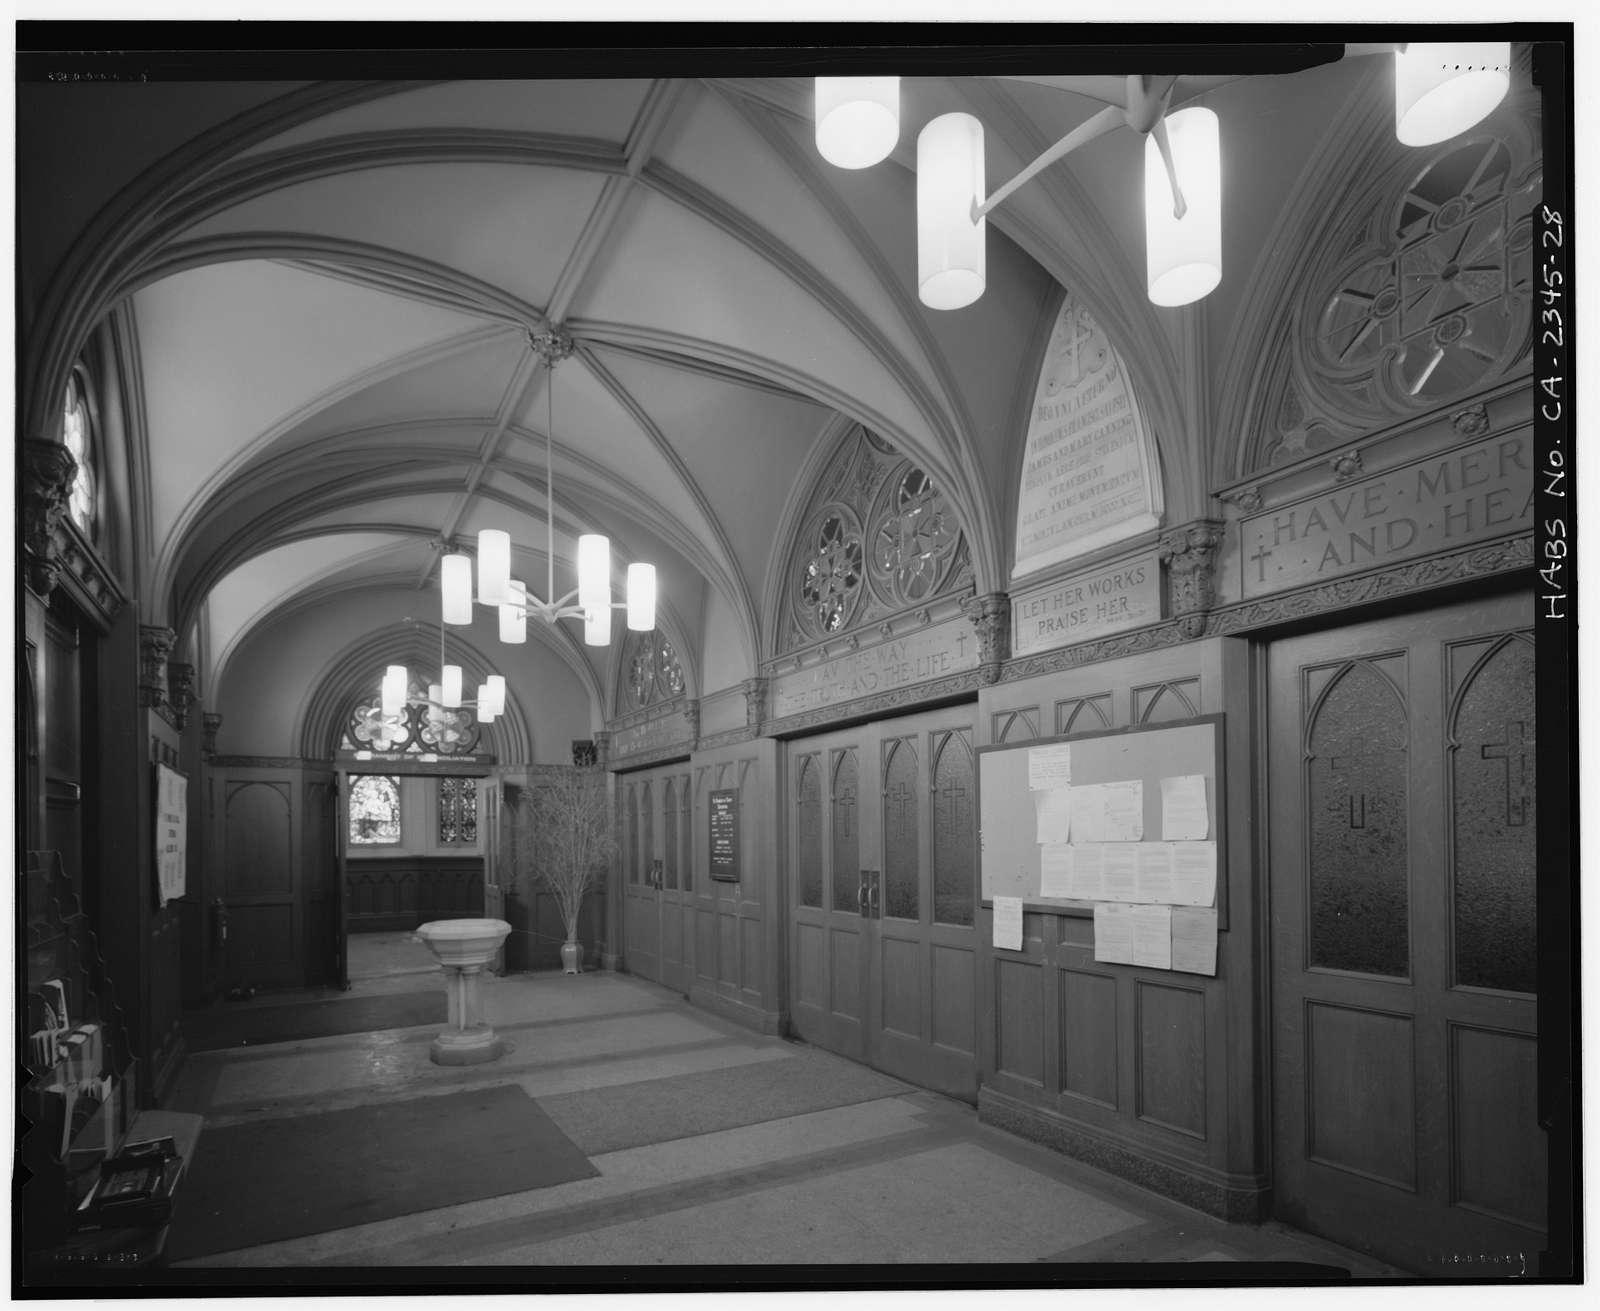 St. Francis de Sales Church, 2100 Martin Luther King, Jr. Way, Oakland, Alameda County, CA